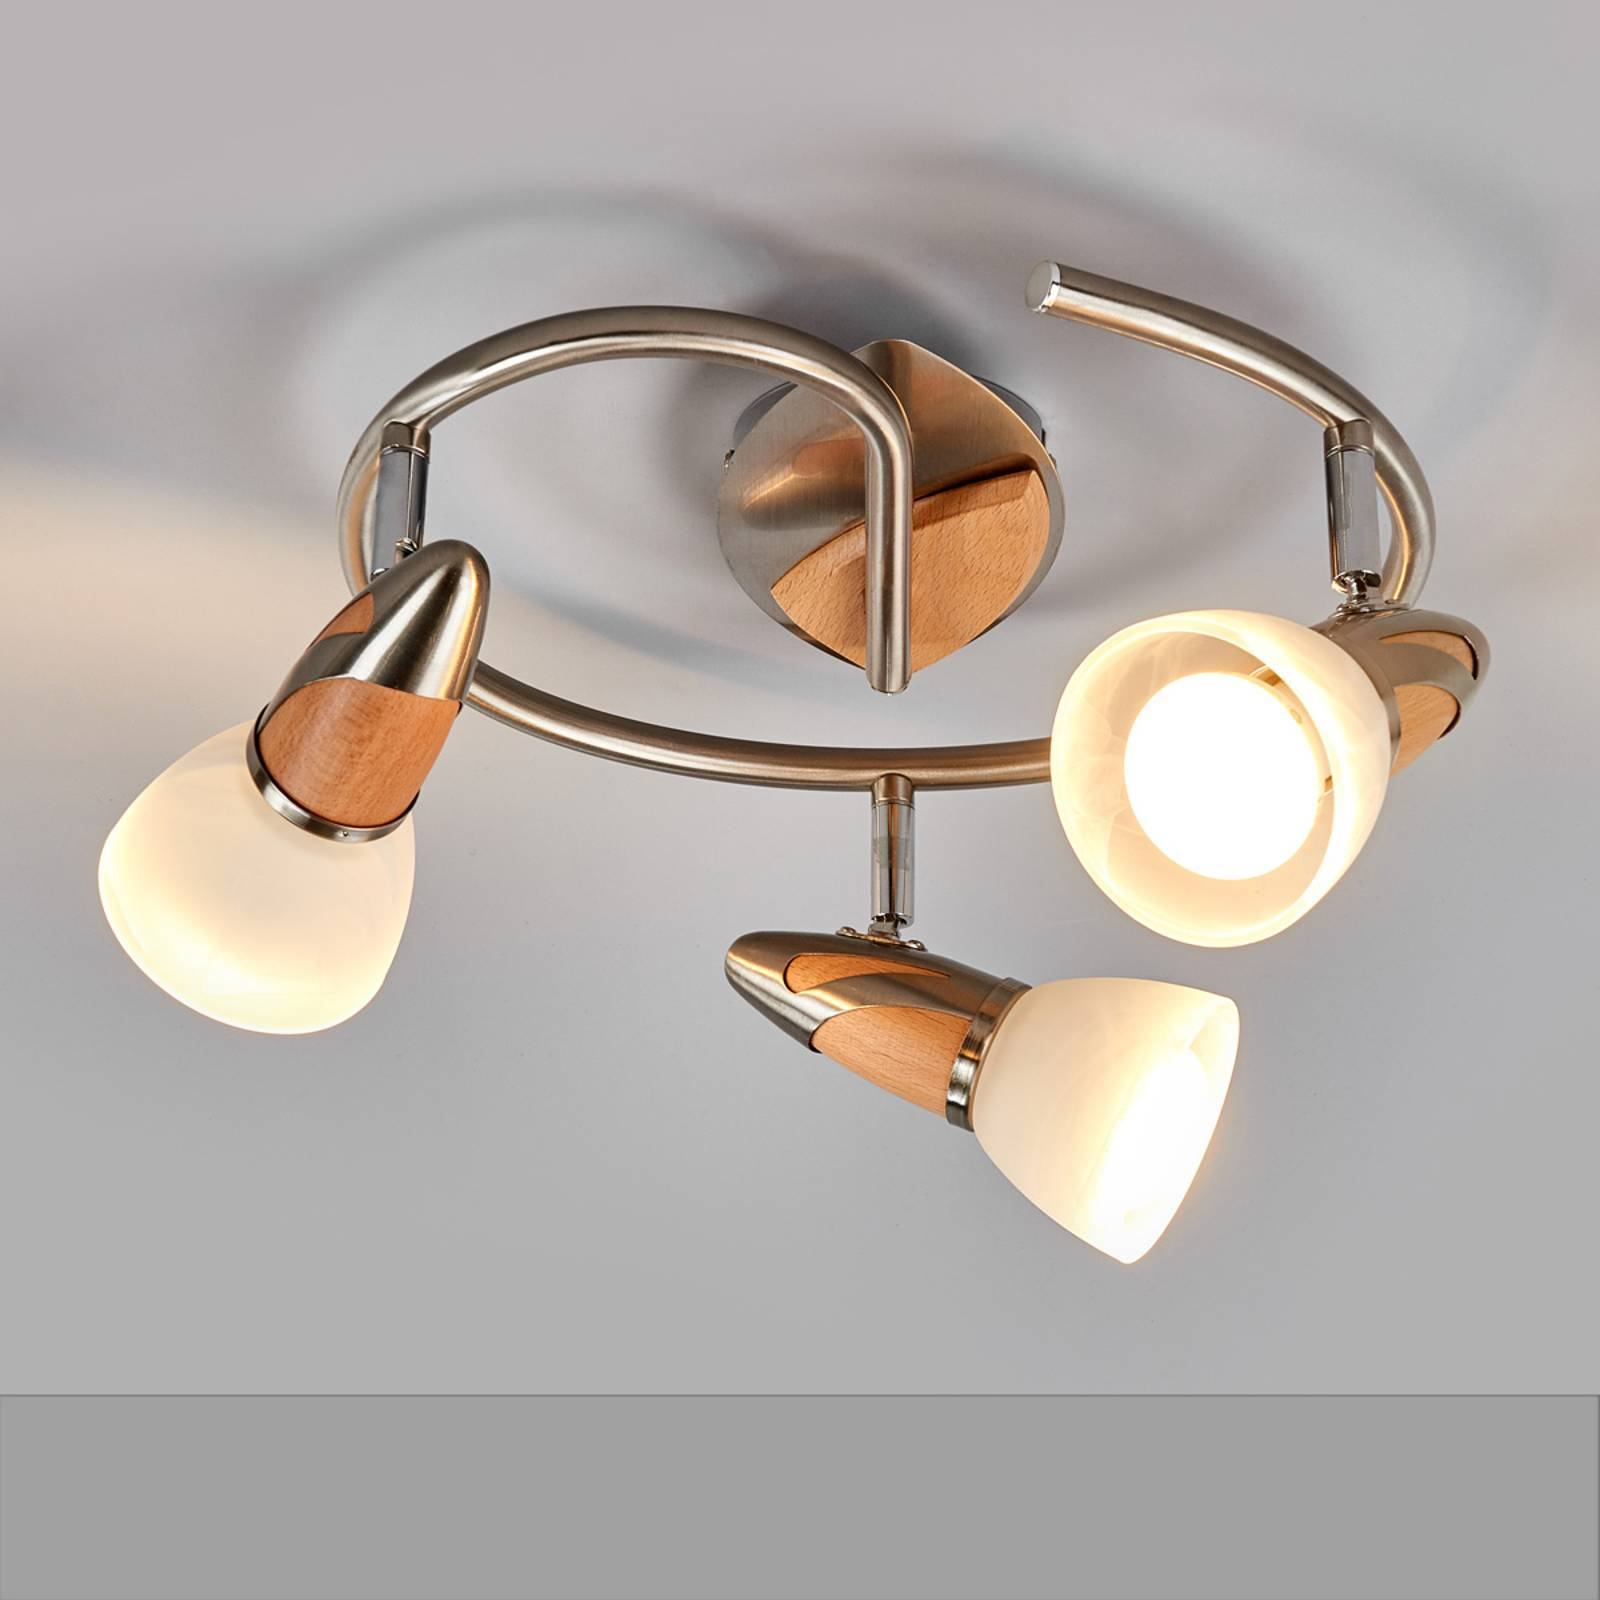 MARENA - 3-punktowa lampa sufitowa LED